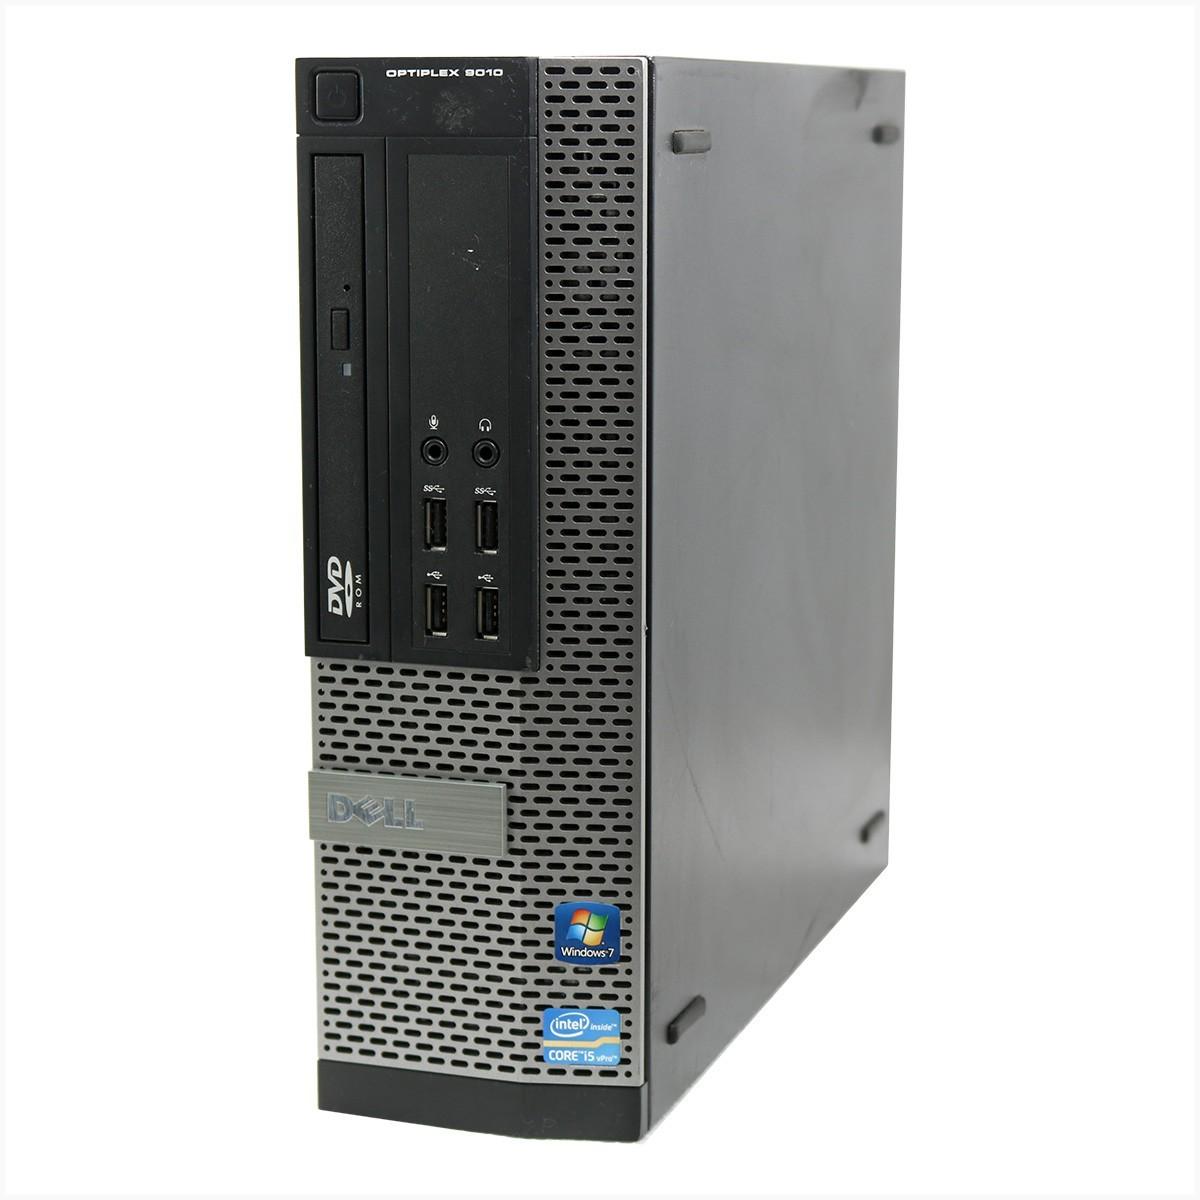 Desktop Dell Optiplex 9010 Mini i5 4gb 250gb - Usado